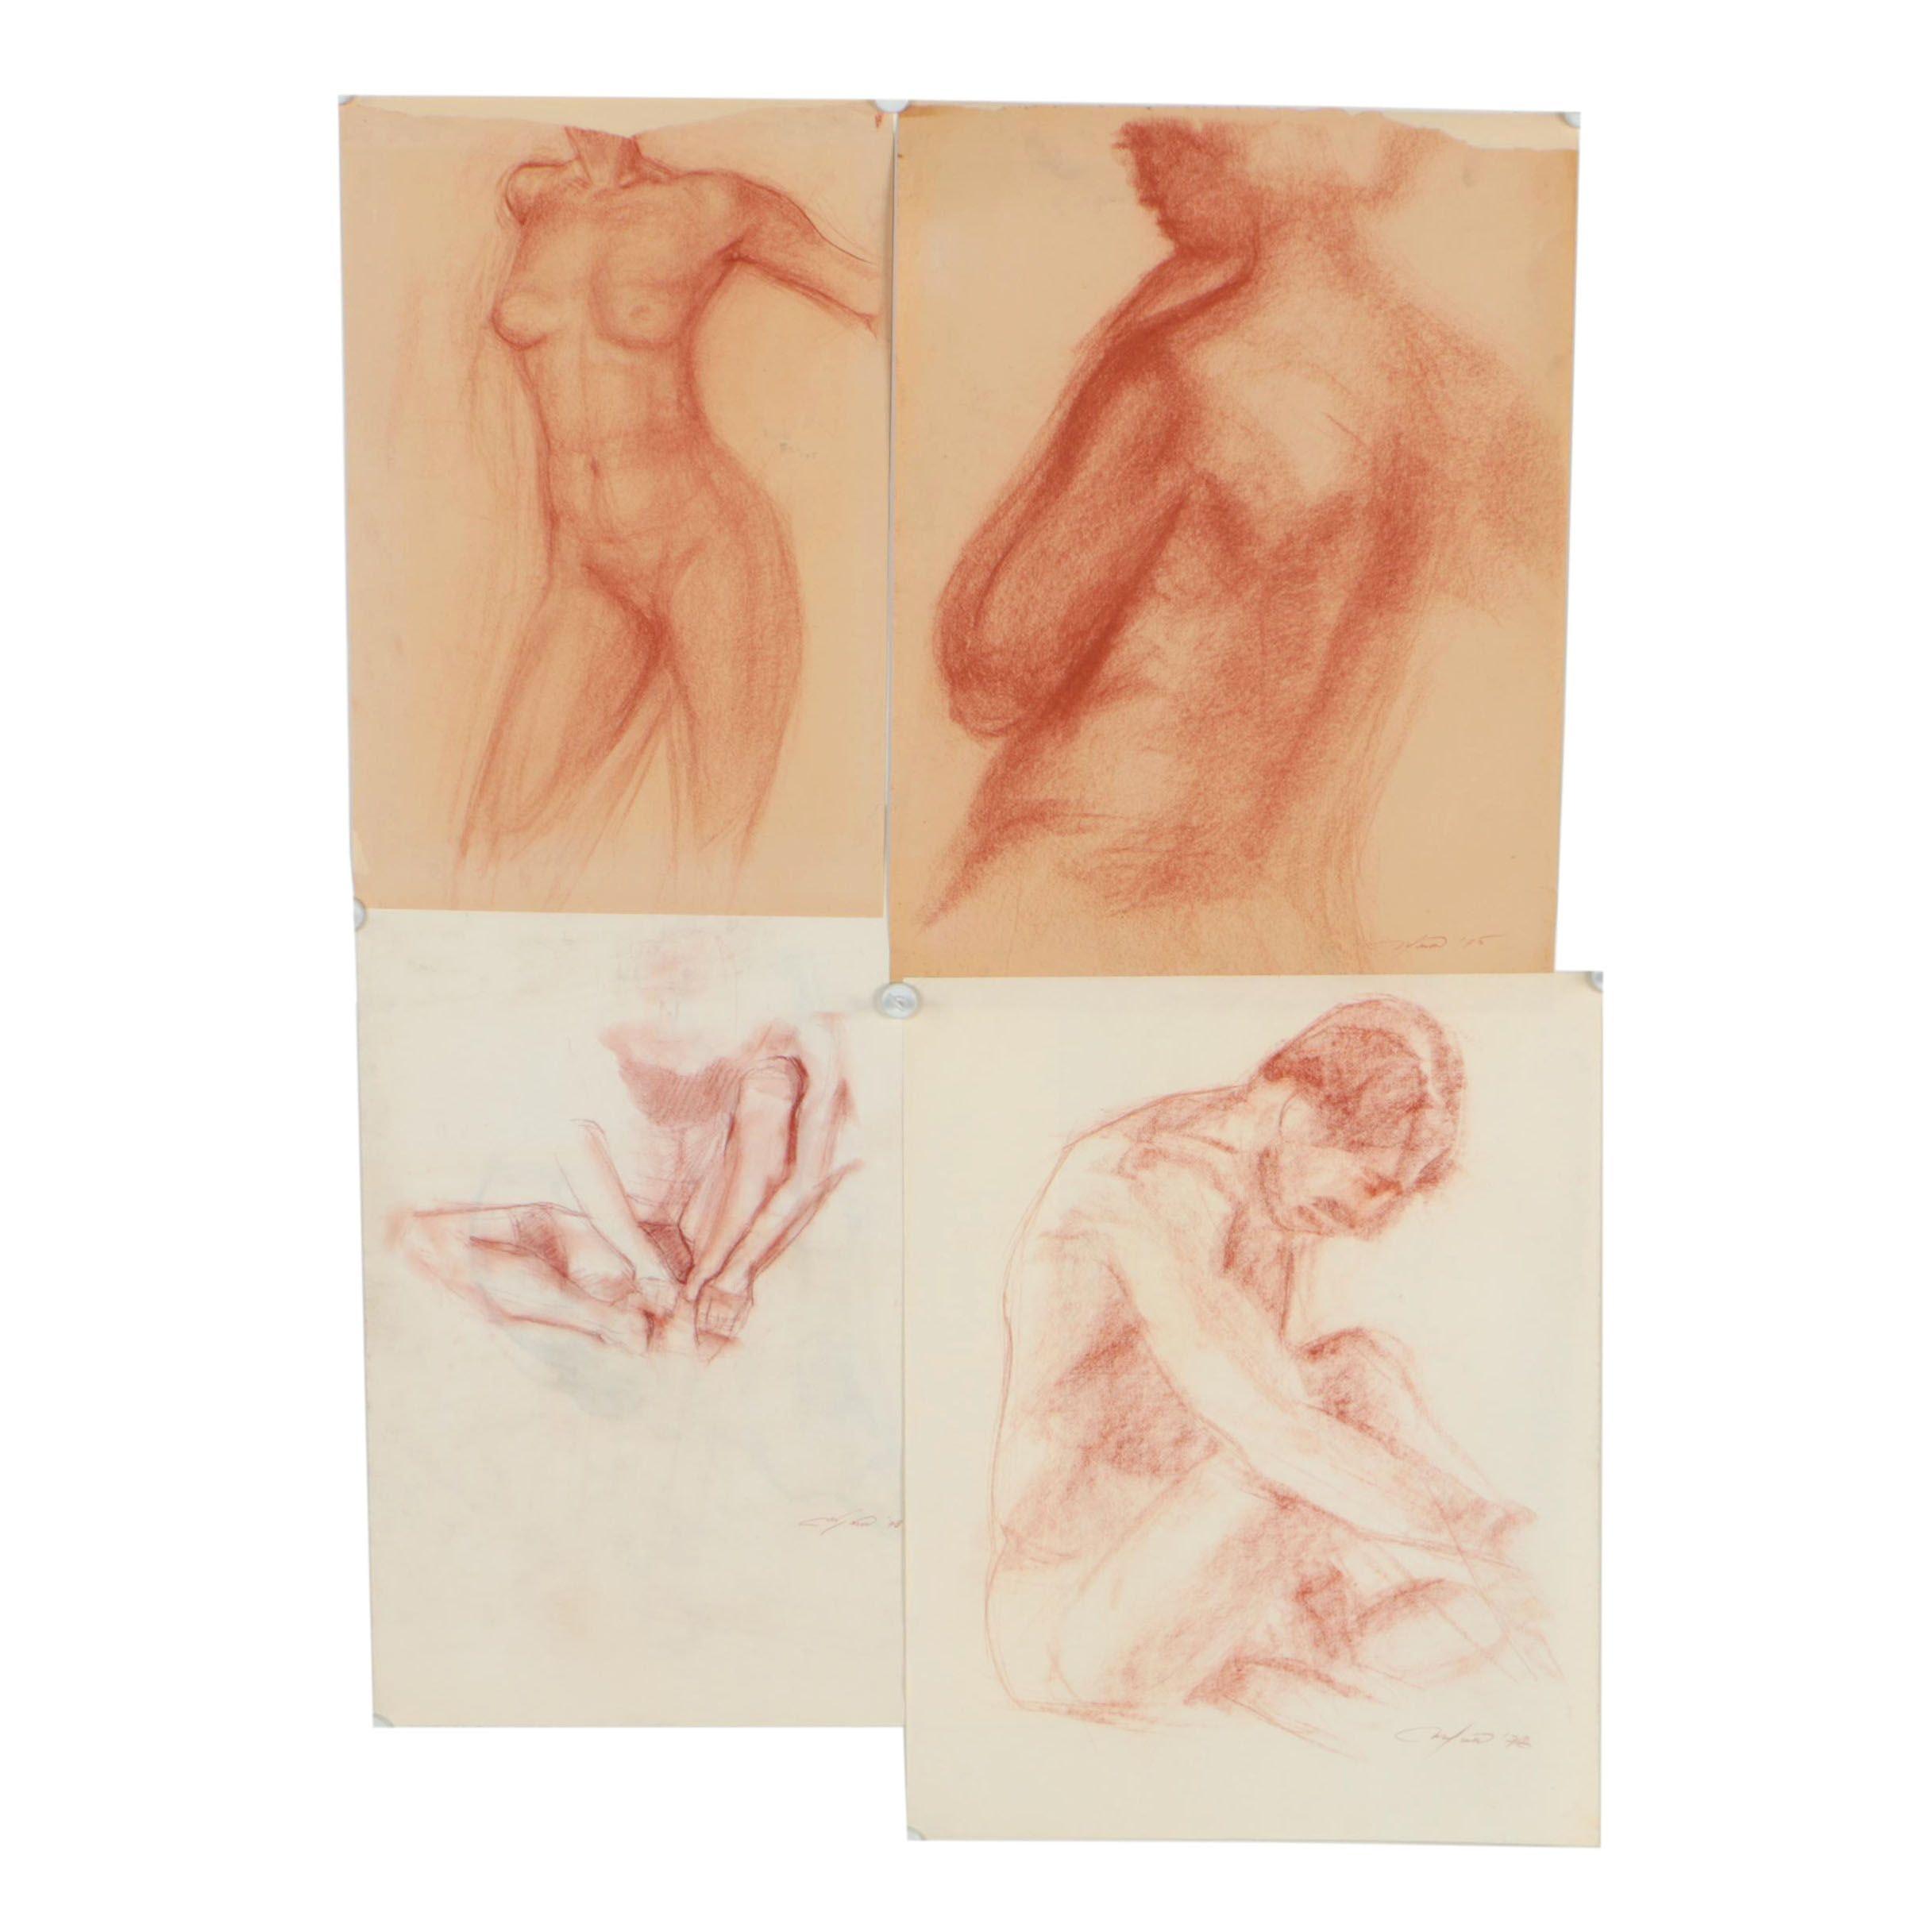 Ricardo Morin 1975-1978 Sanguine Drawings of Nude Figures